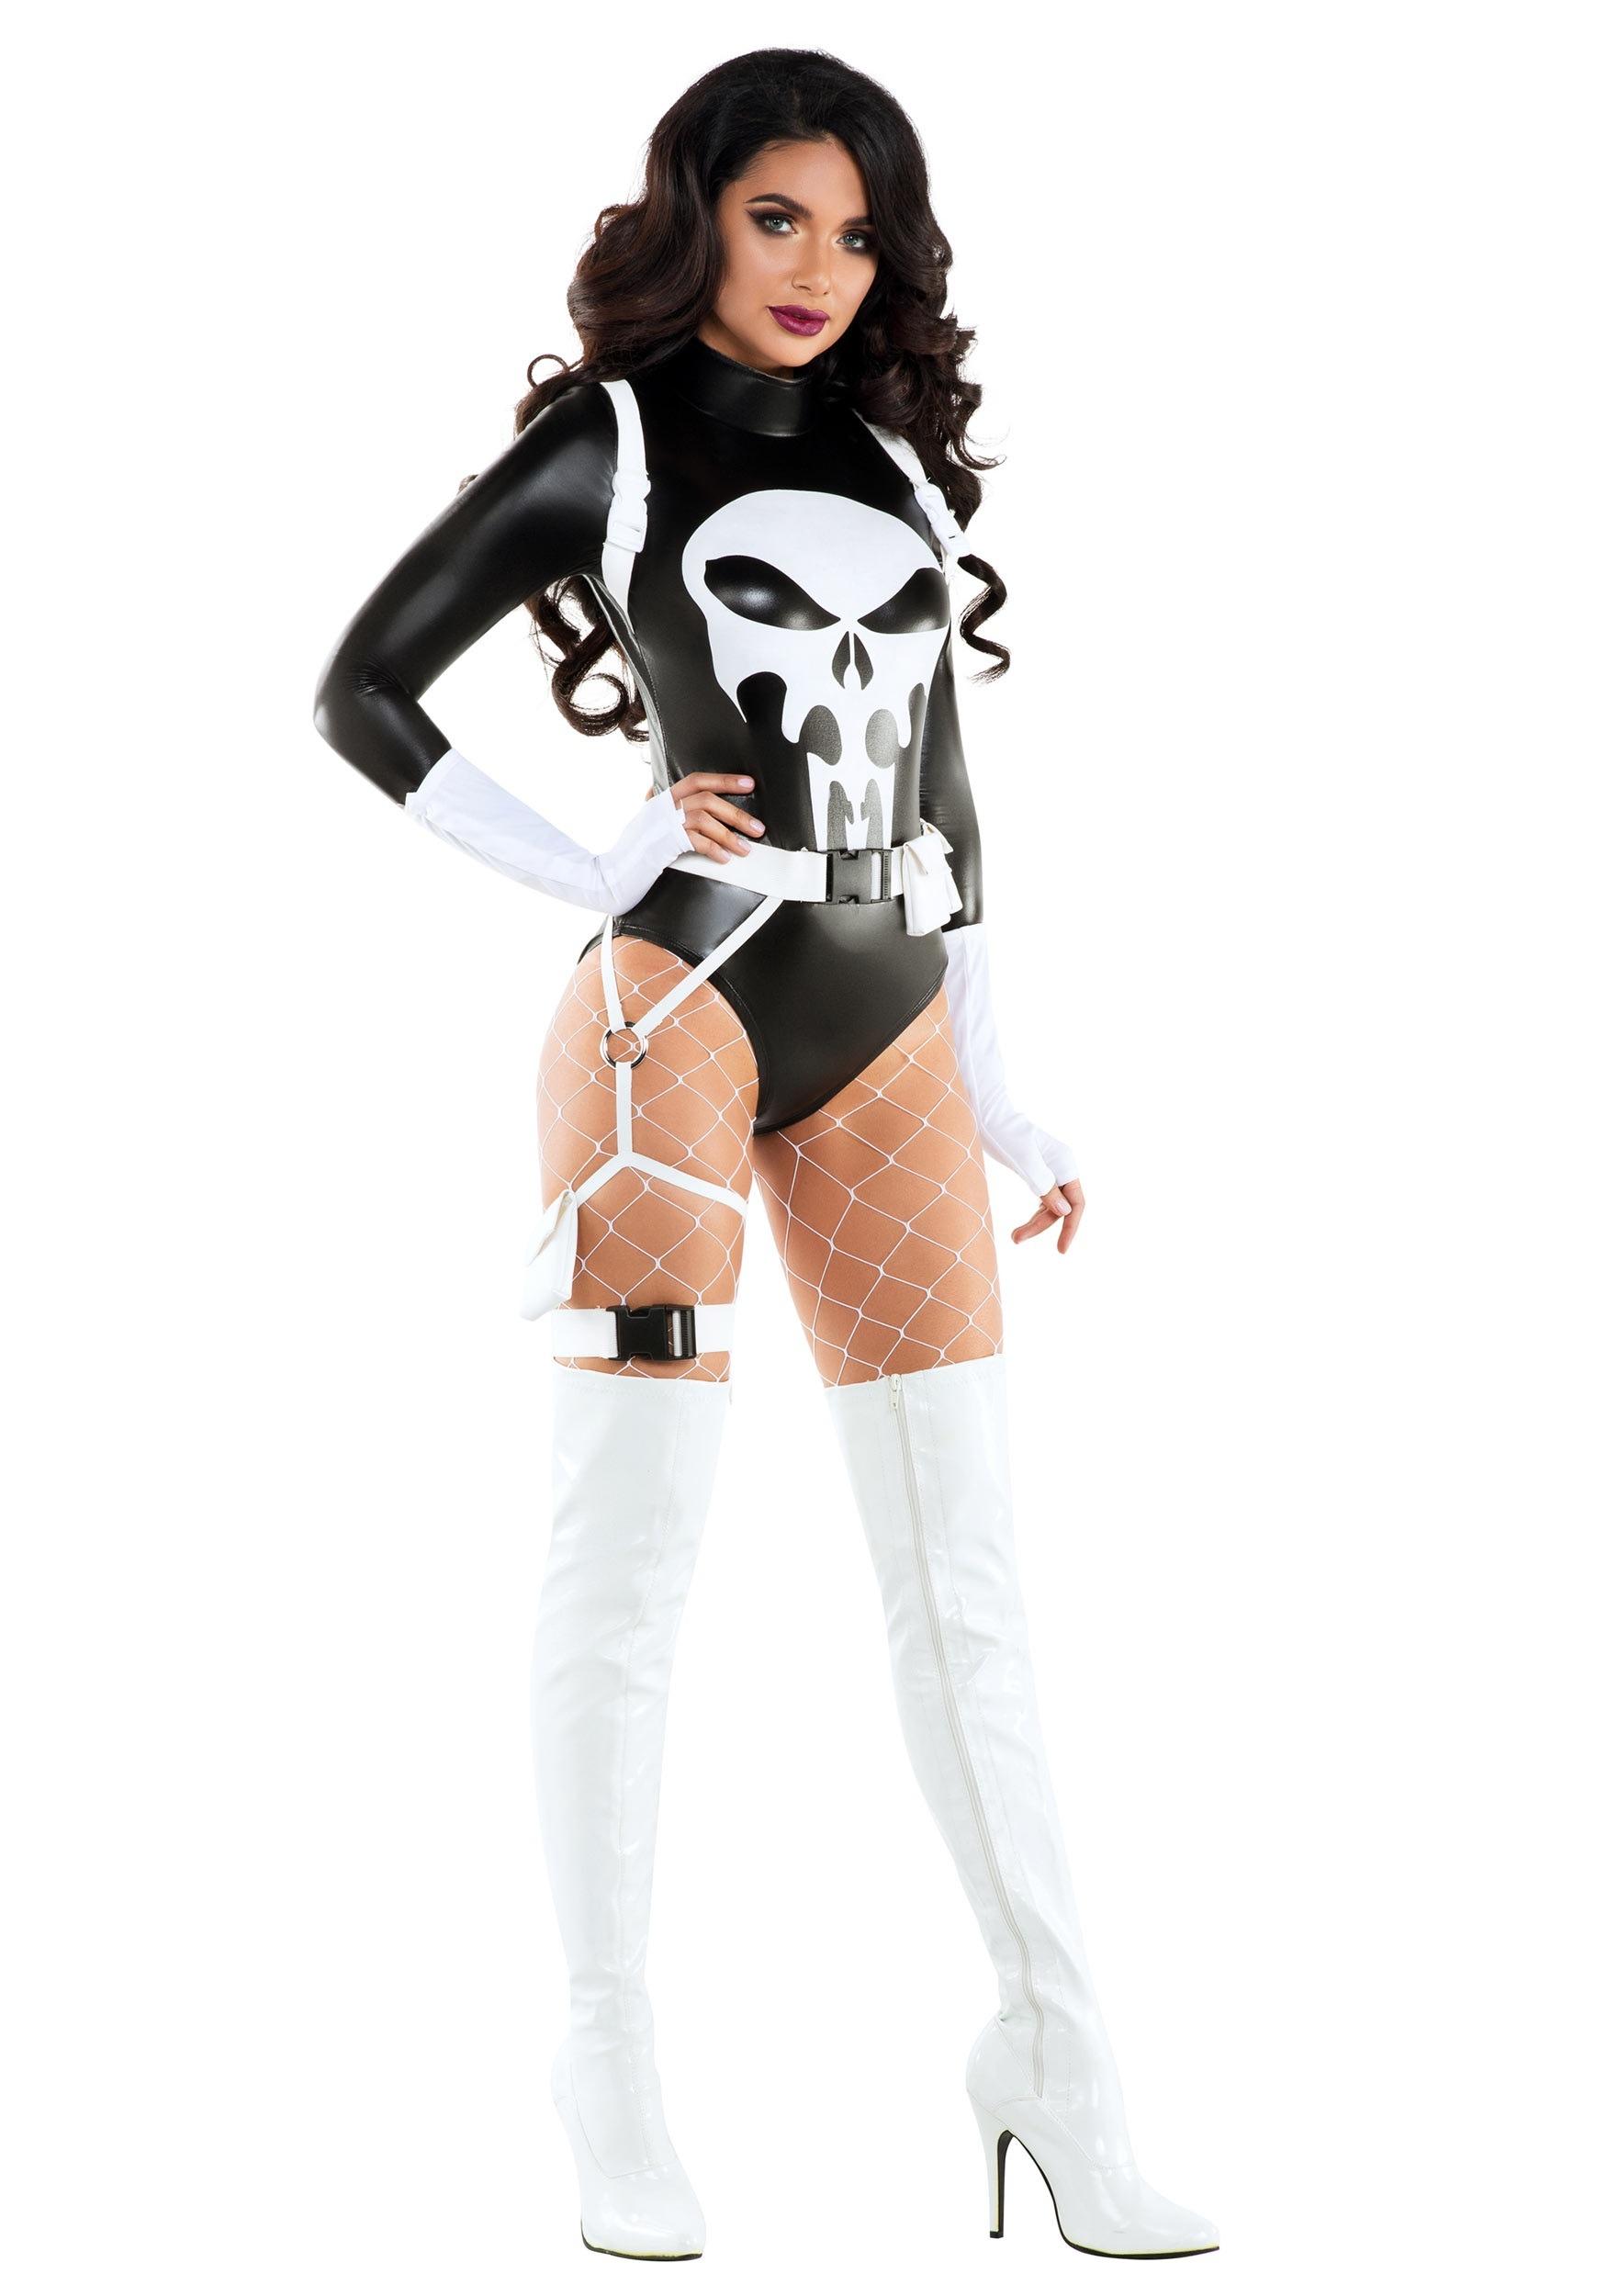 Daredevil Costumes